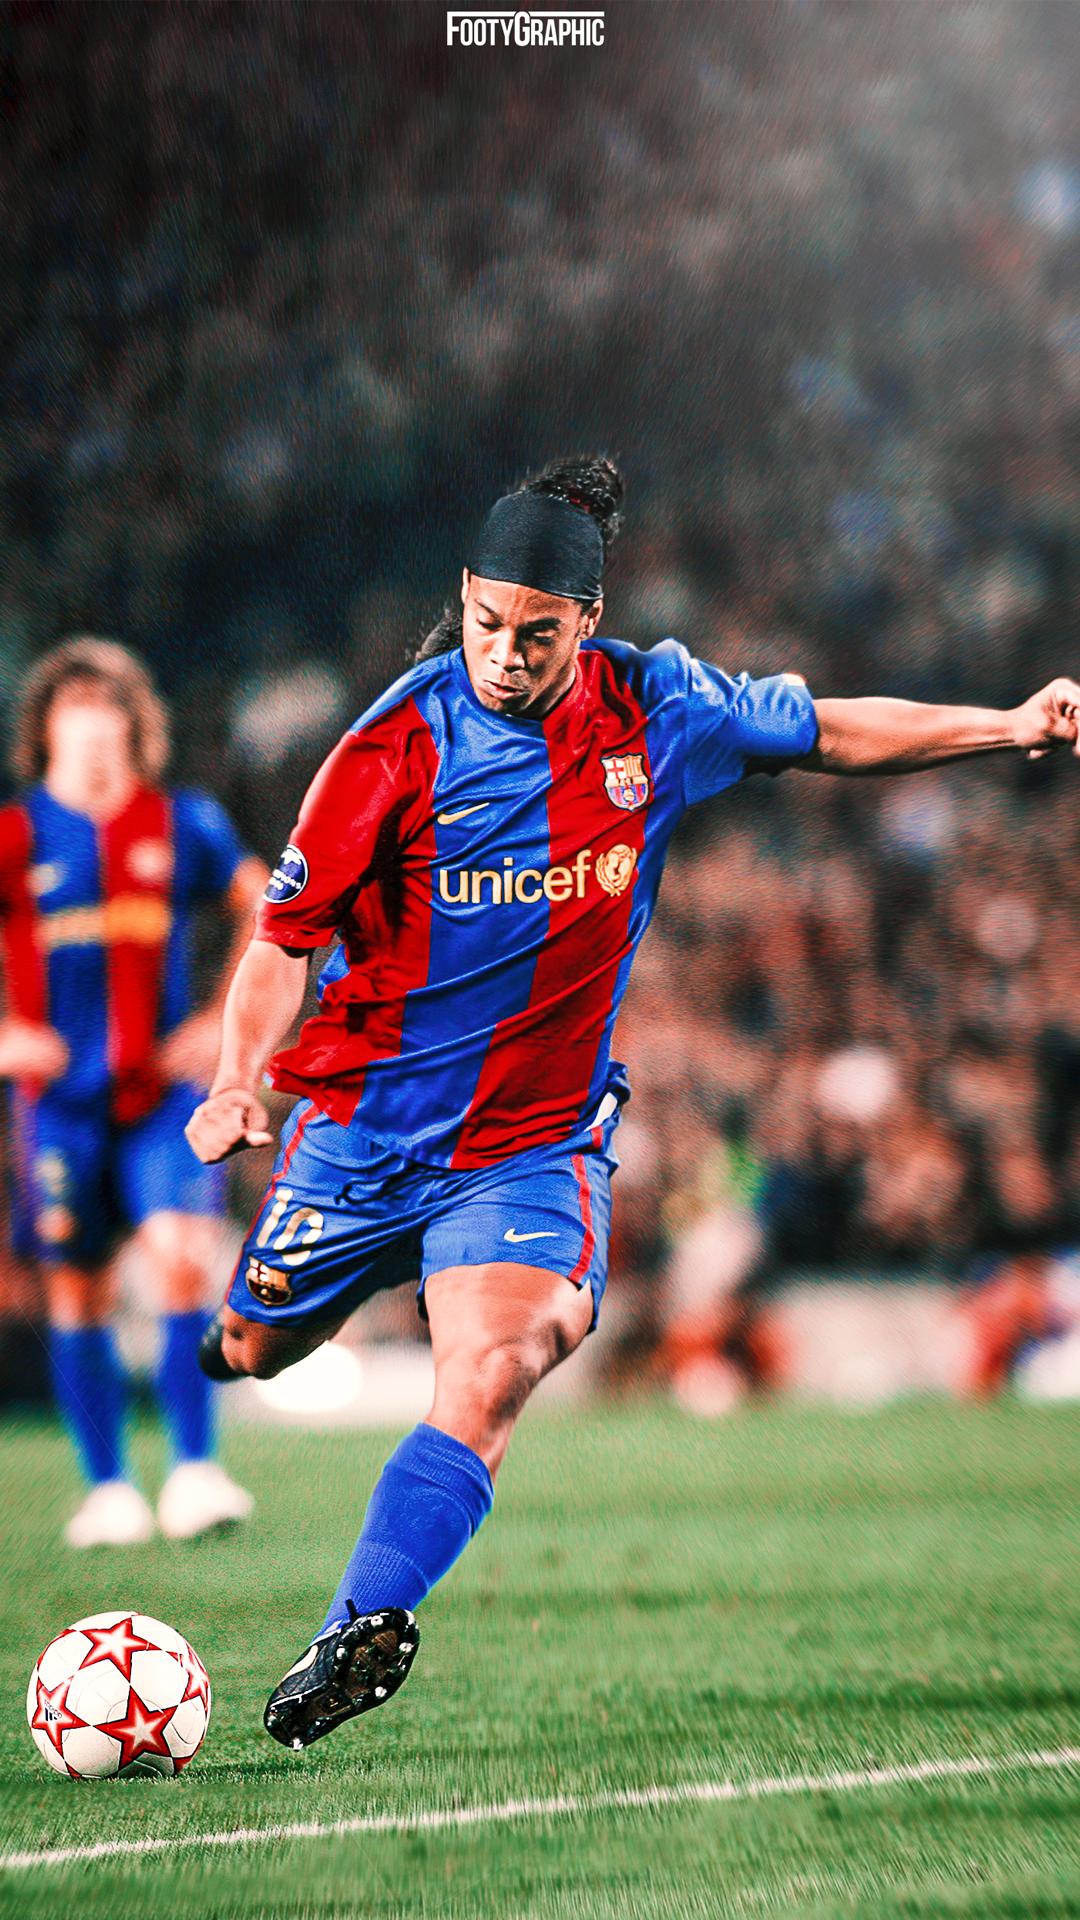 Ronaldinho Footygraphic Football Lockscreens And Desktop Wallpapers Barcelona Soccer Barcelona Football Ronaldo Football